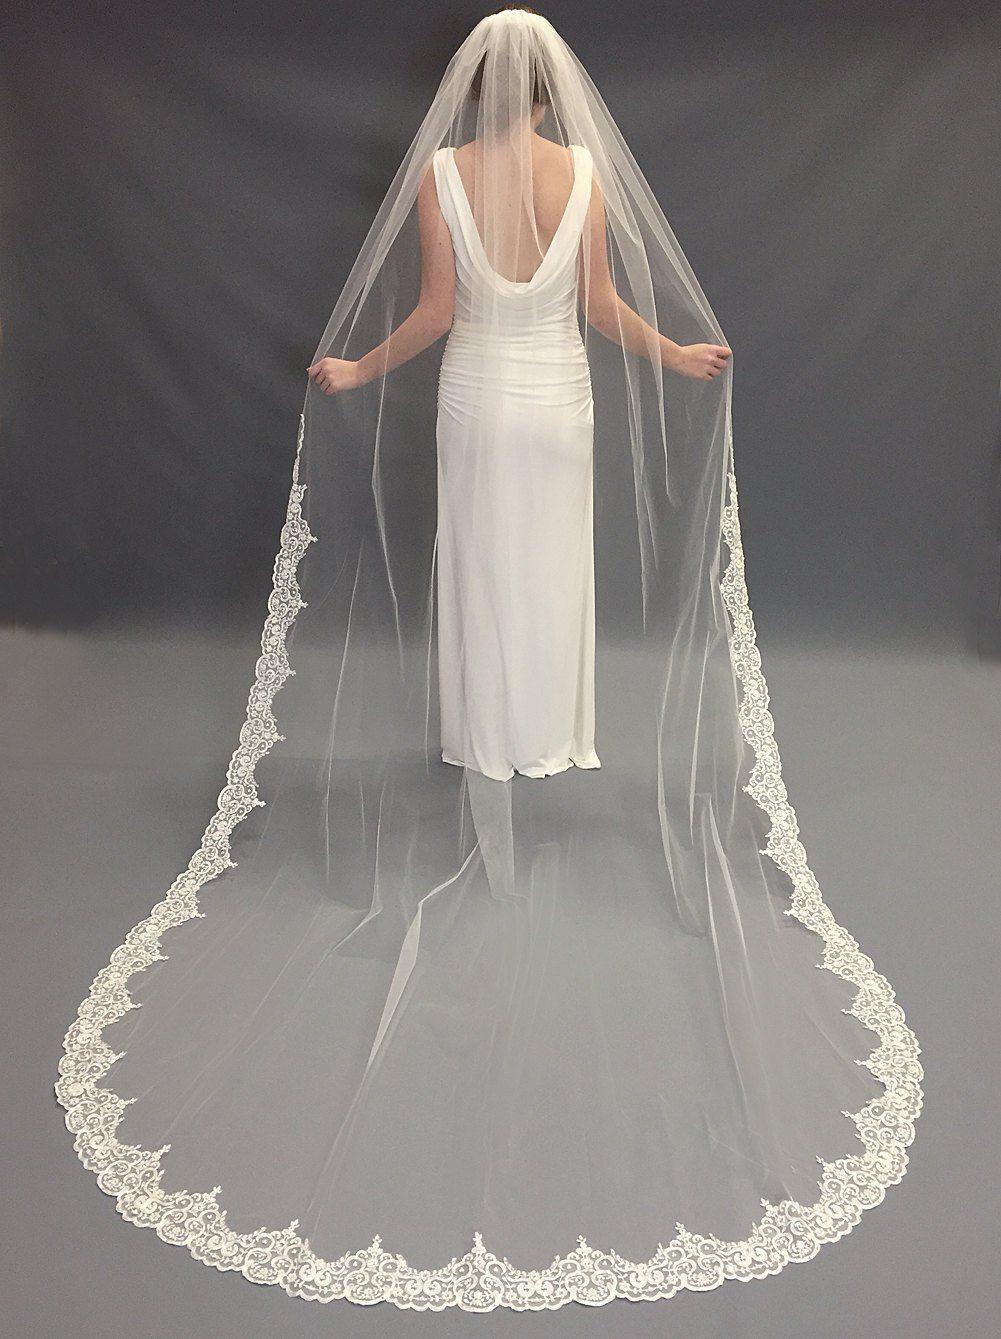 Pearl Lace Wedding Veil Rhinestone Bridal Veil Lace Etsy